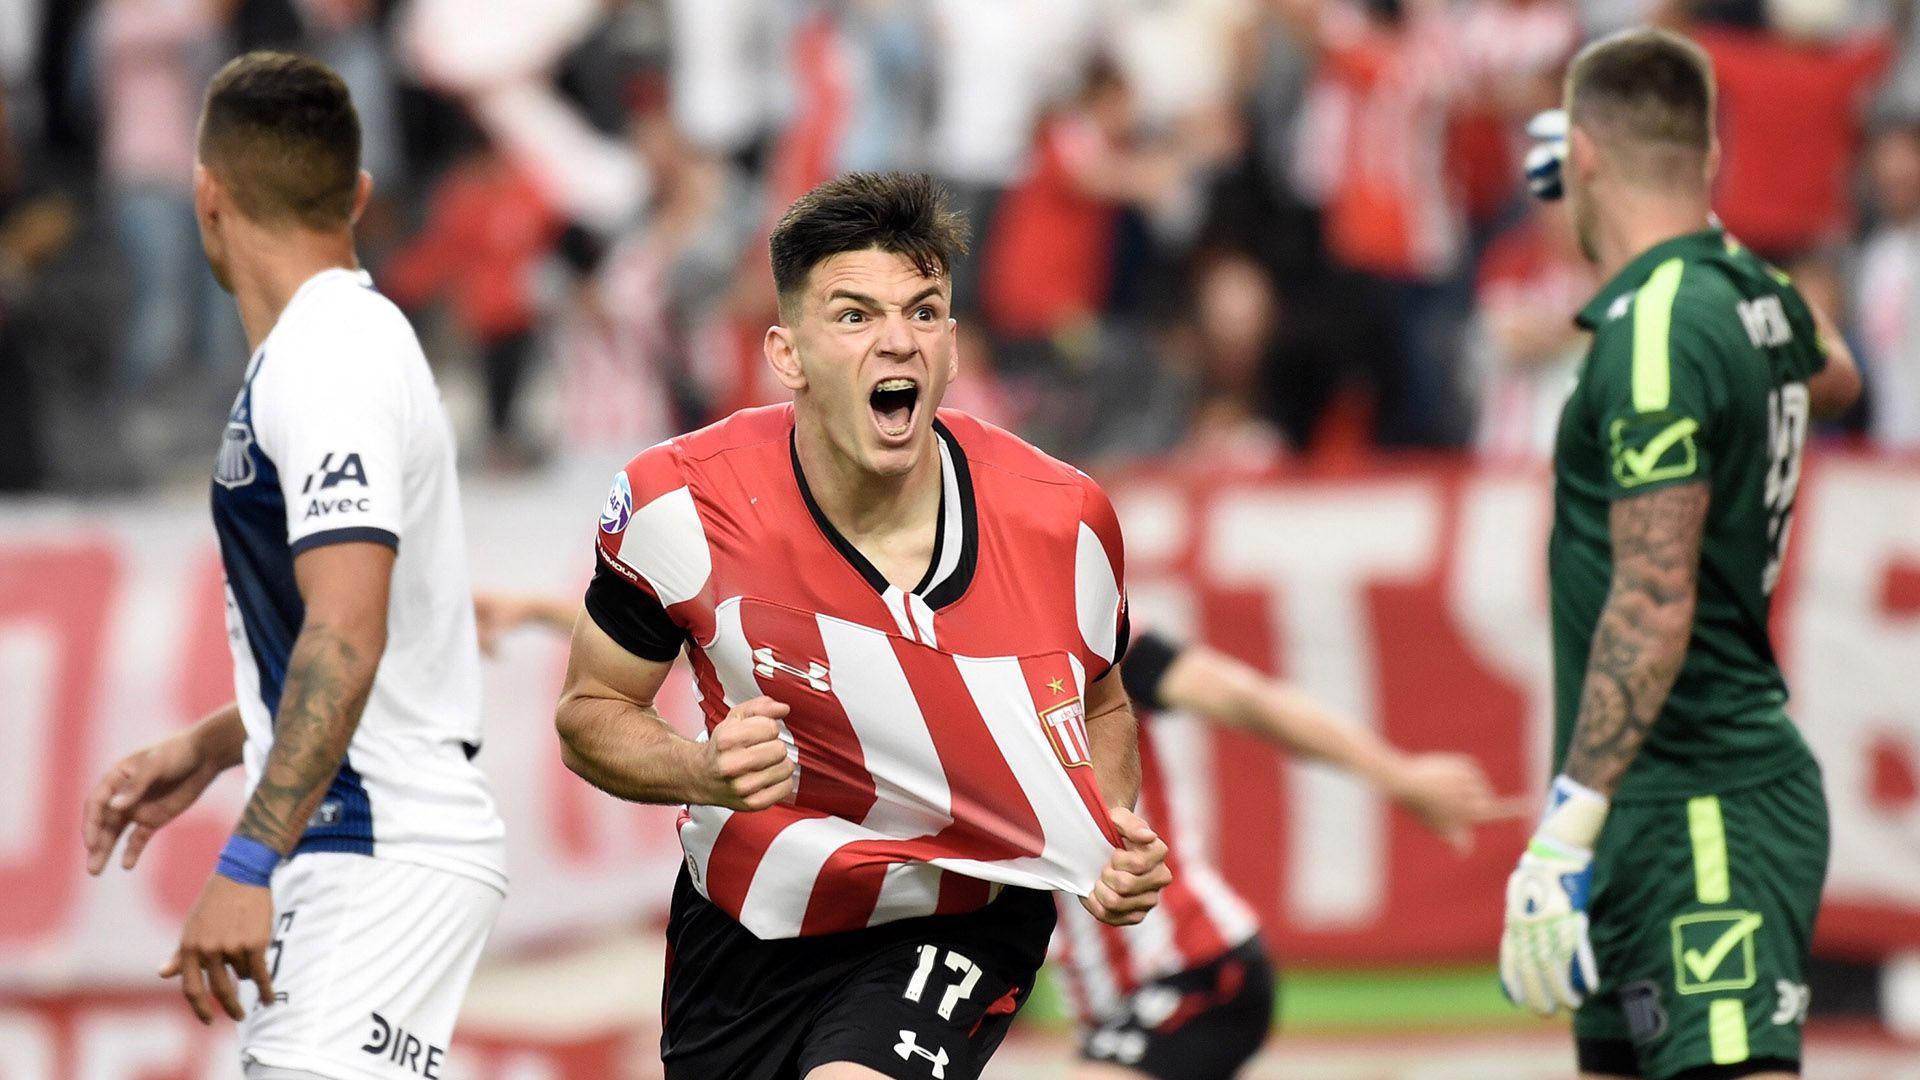 Manuel Castro festeja el gol de Estudiantes (Foto Baires)